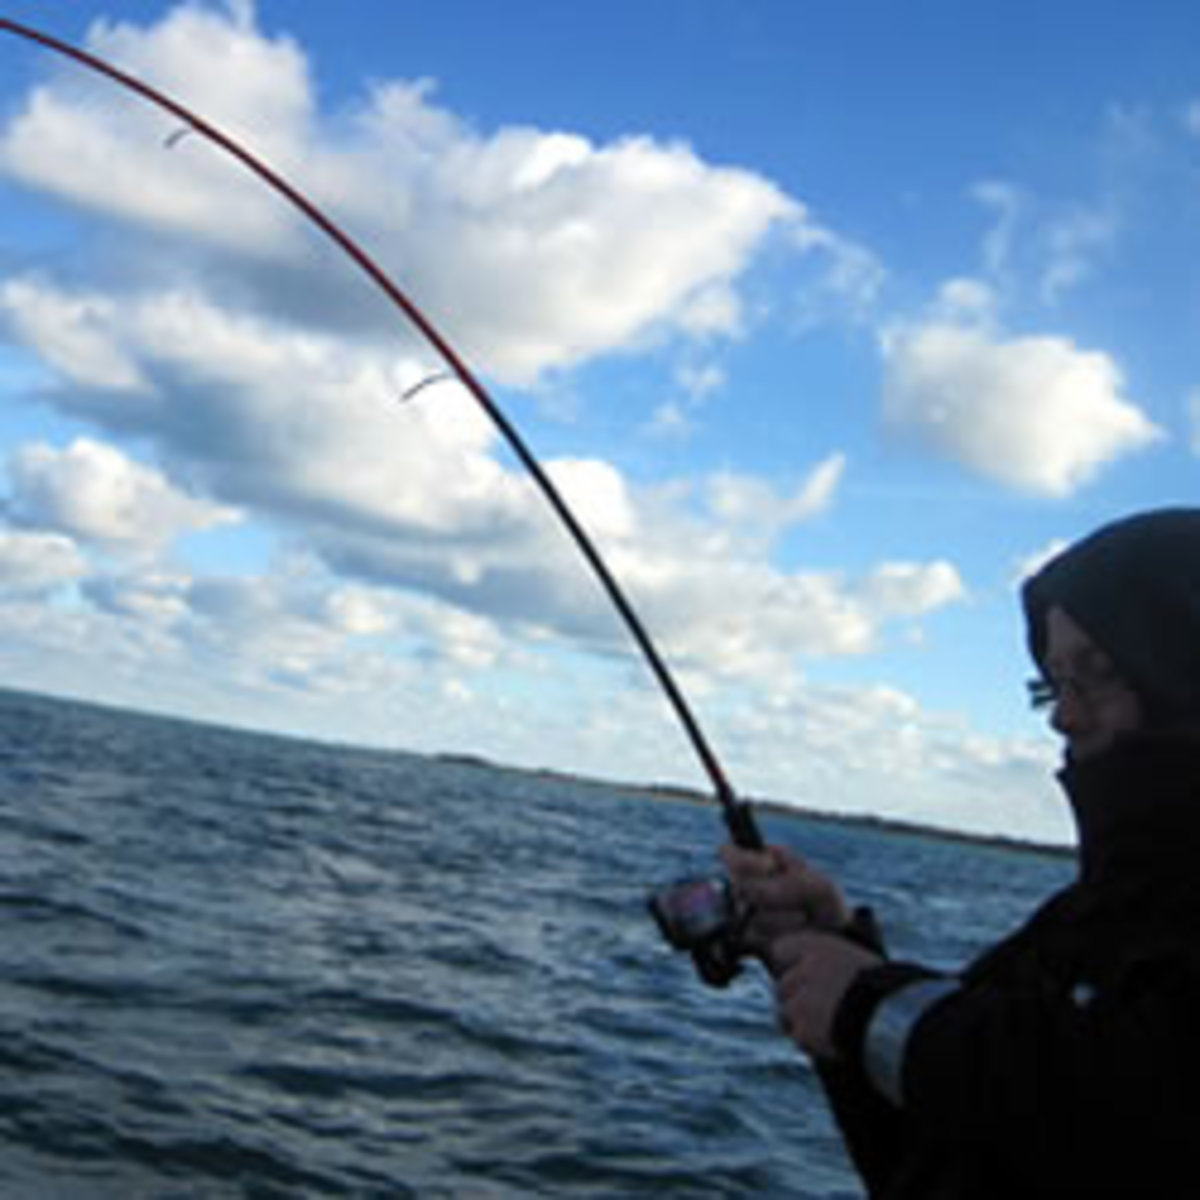 Sea Fishing - What Do I Do?